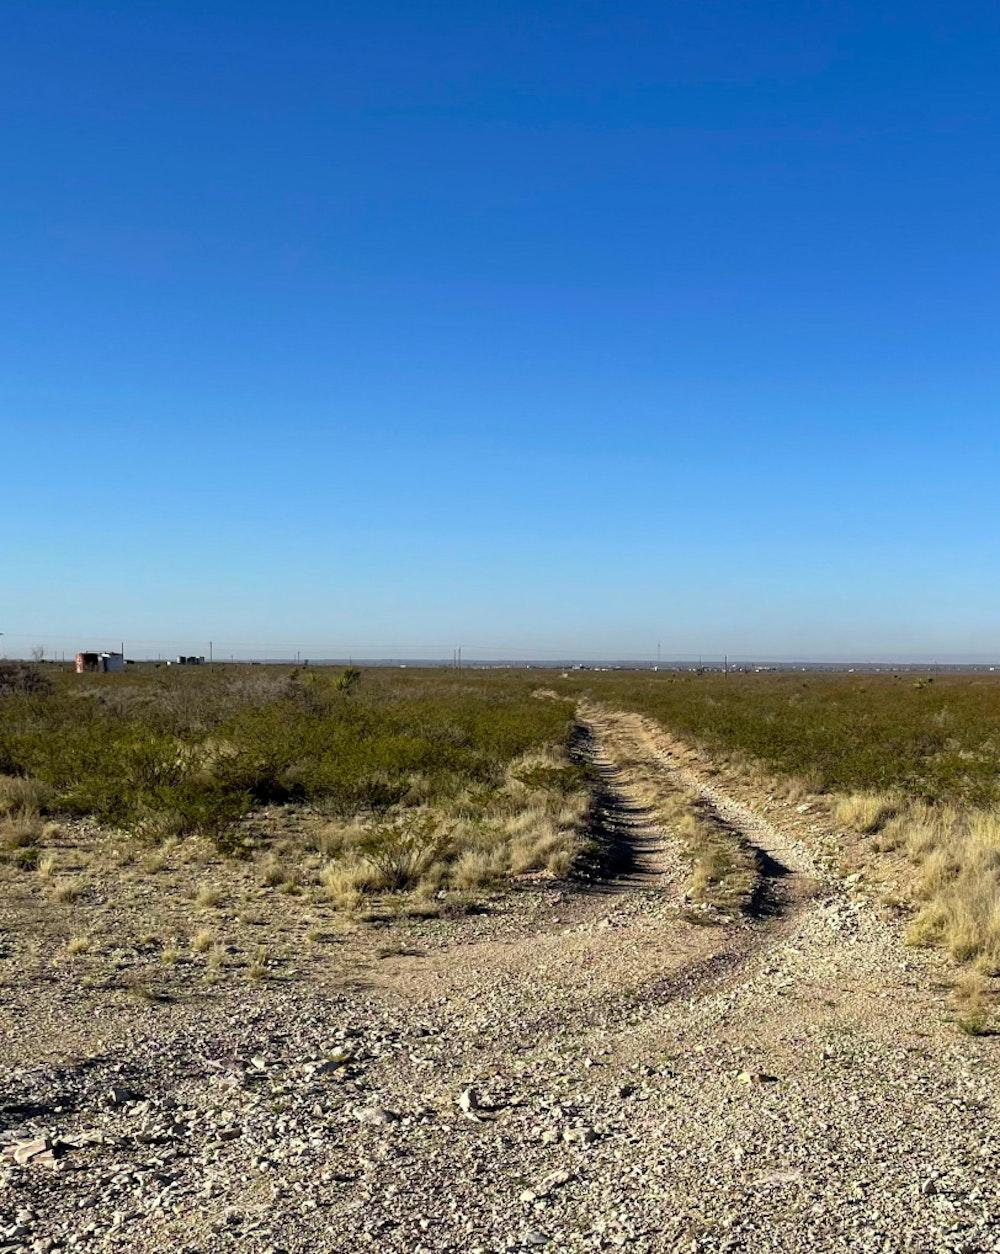 A photo of the location of the future Nacero Penwell Texas facility